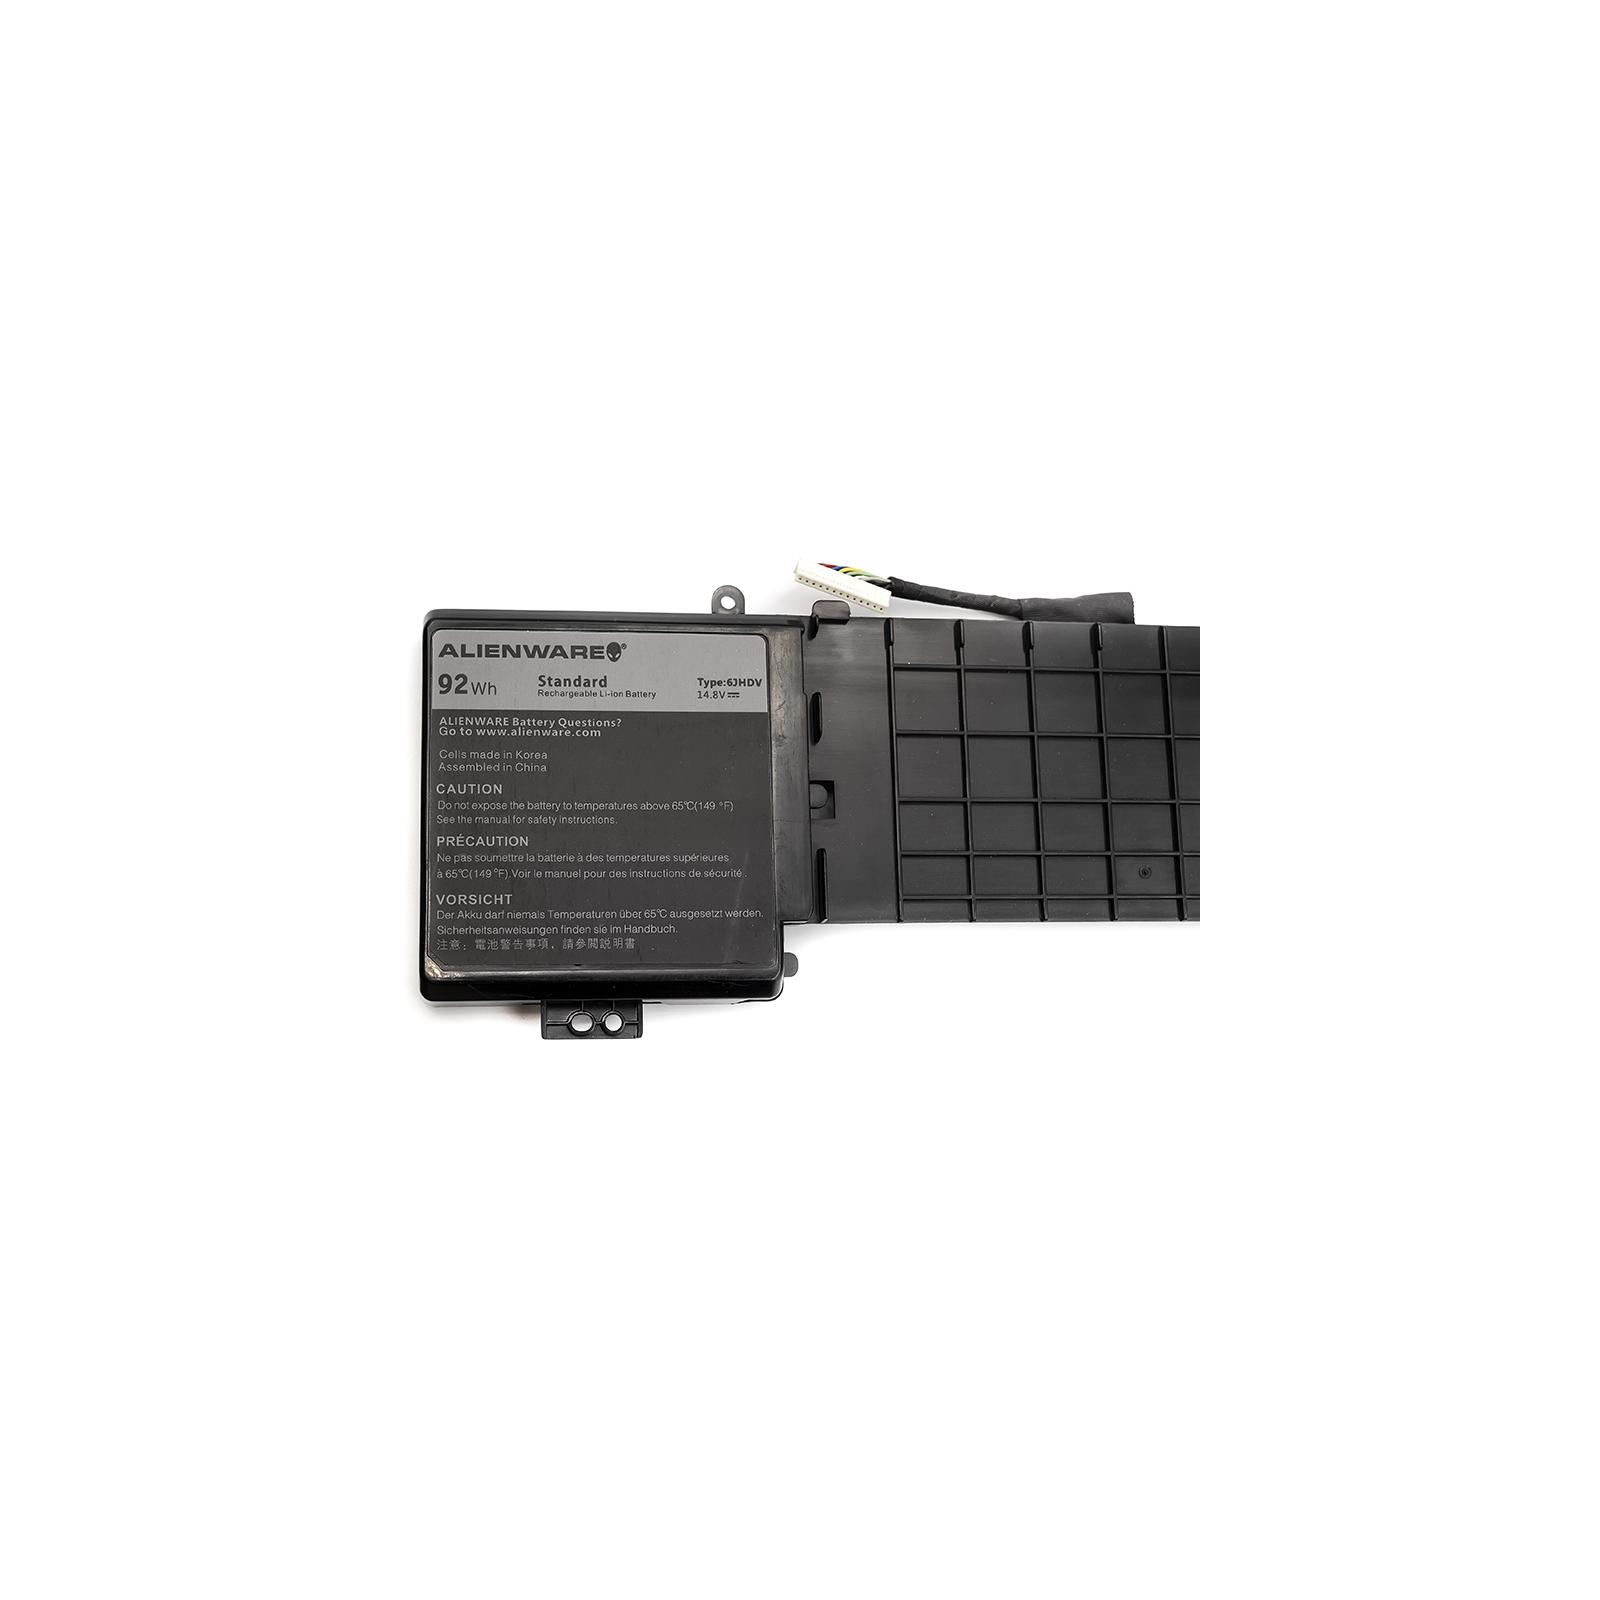 Аккумулятор для ноутбука Dell Alienware 17 R2 (6JHDV) 14.8V 92Wh (NB441129) изображение 3